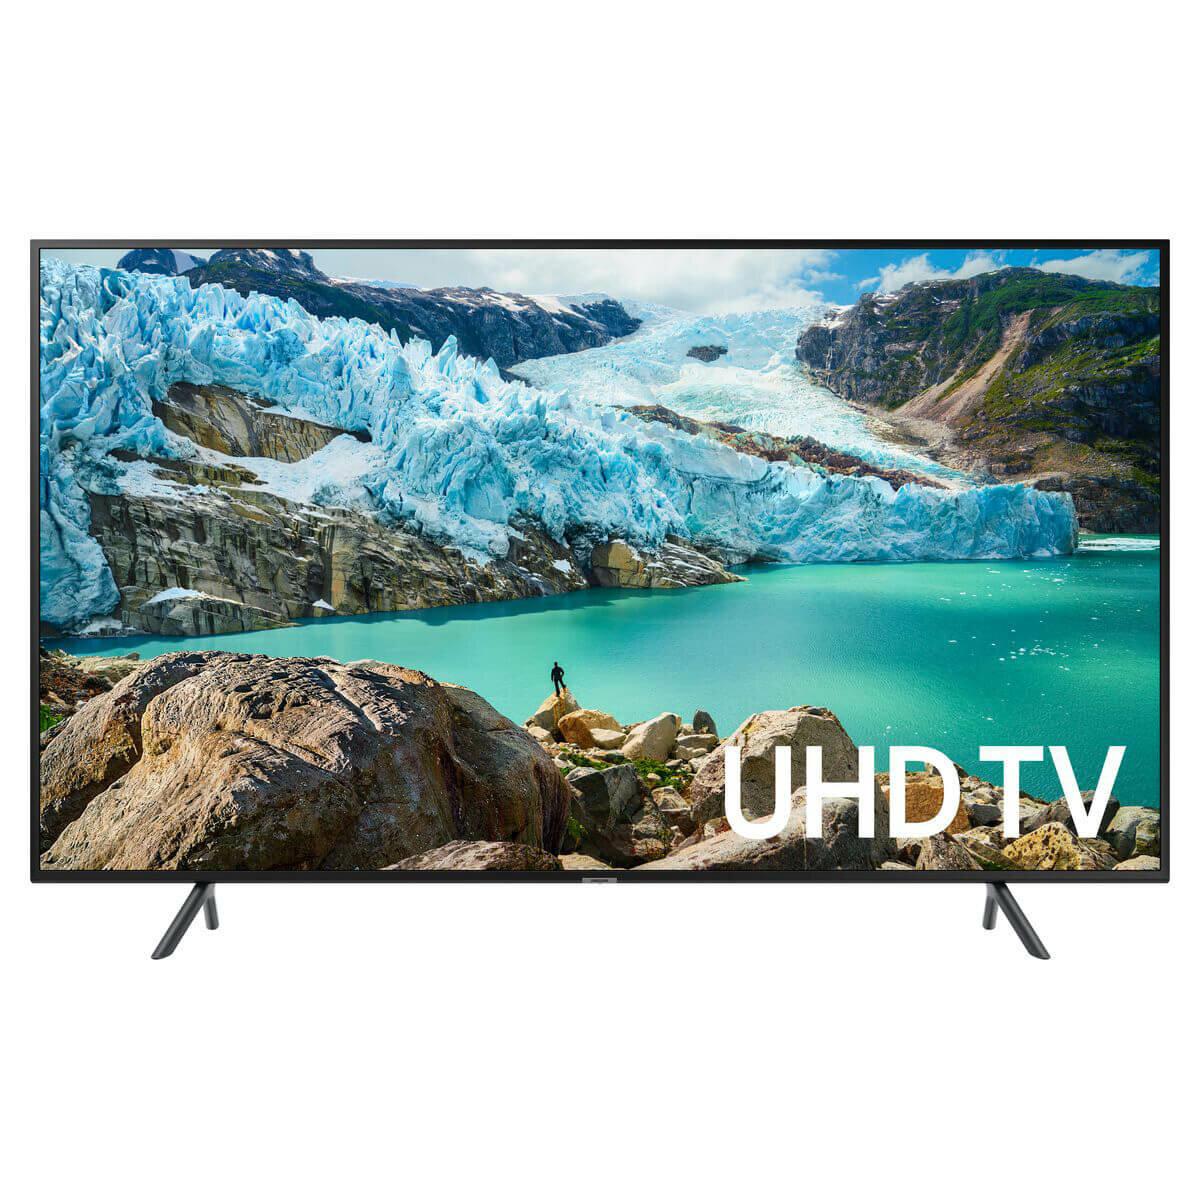 Samsung-75-Inch-190cm-4K-UHD-TV-UA75RU7100WXXY-hero-high